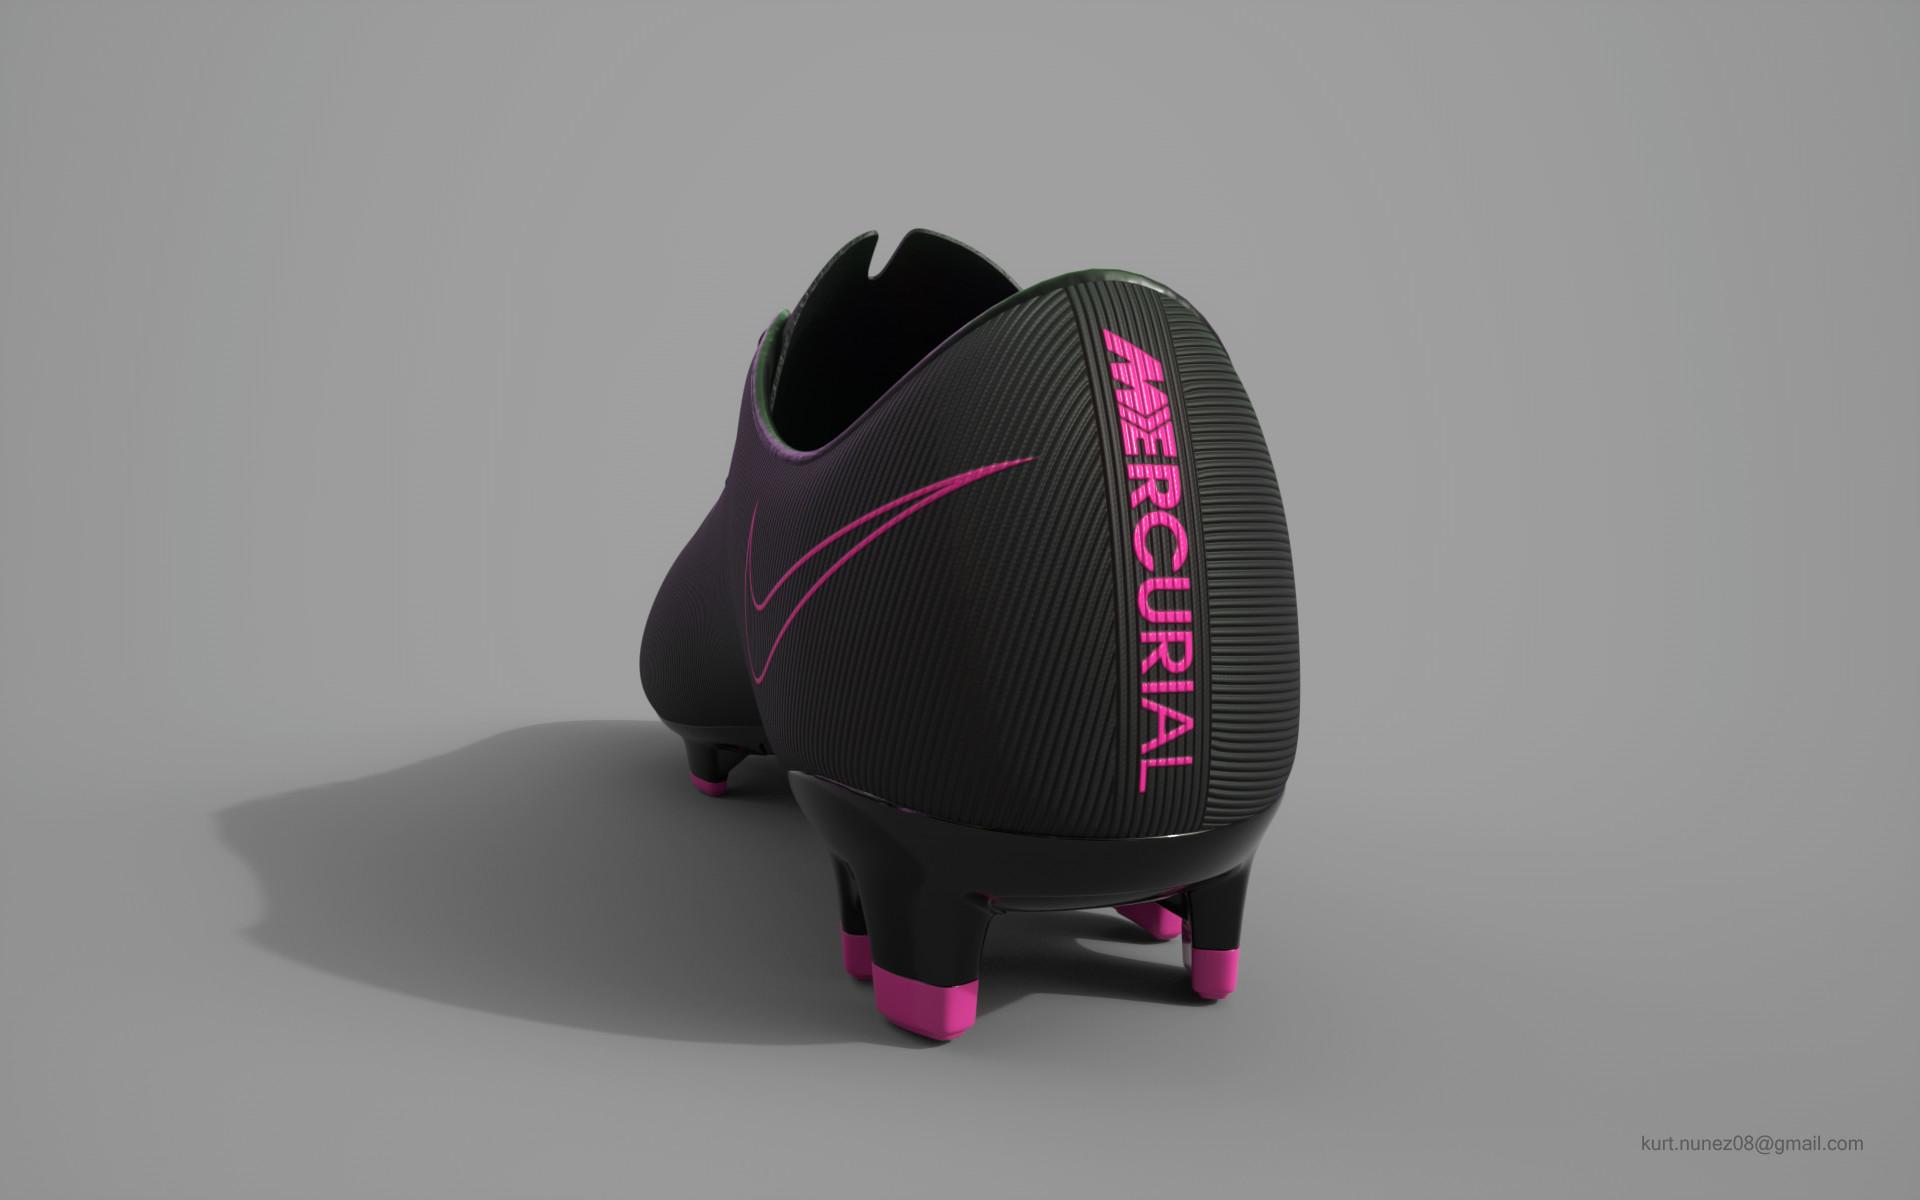 super popular 6346d 1ad40 ArtStation - Mecurial Vapor X 2016 | Nike Shoe, Kurt Nuñez